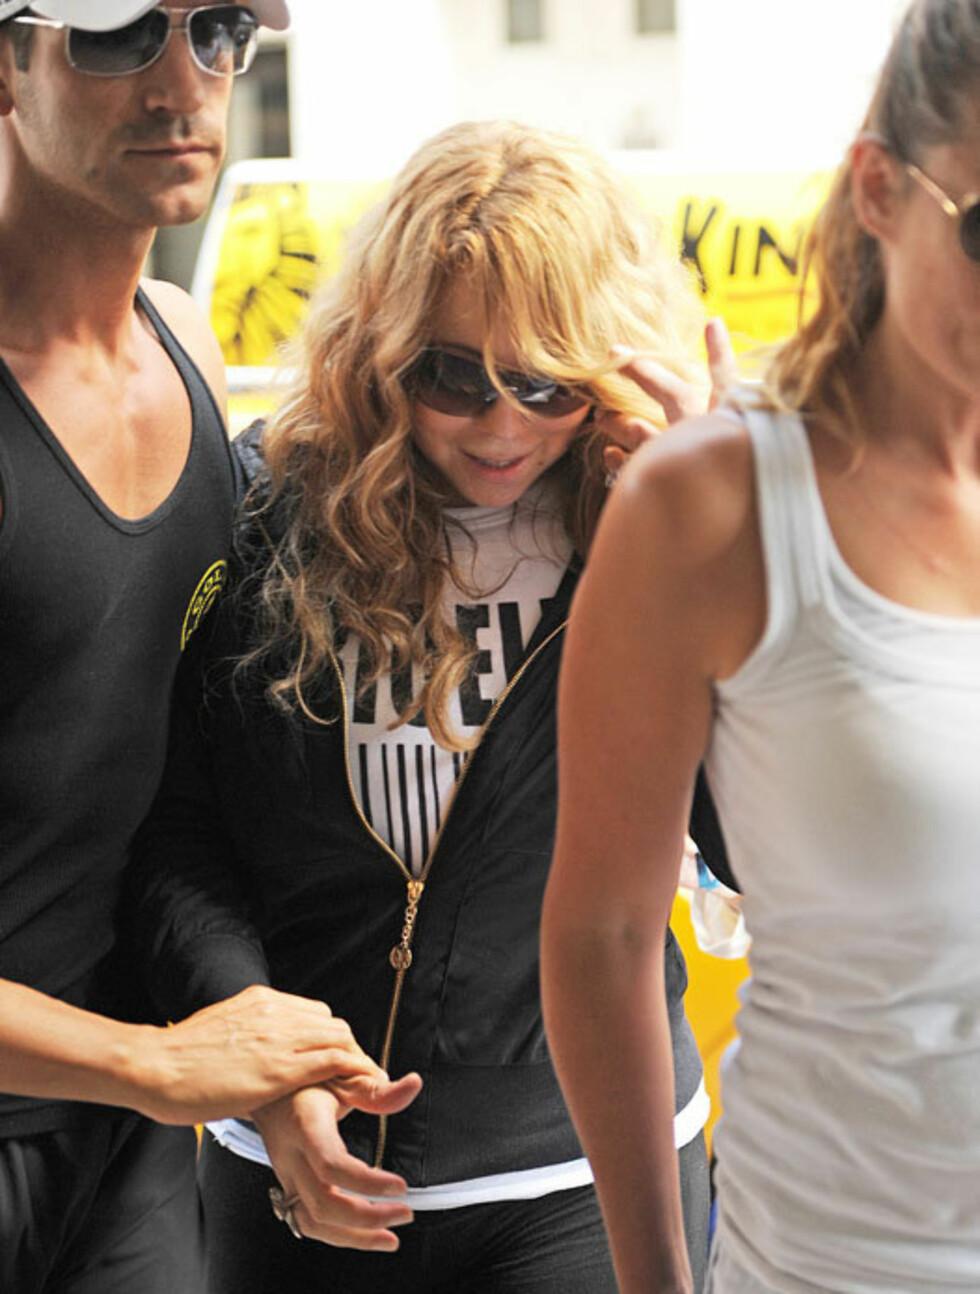 FORMFULL: Mariah Carey har nok merket at tvillinggraviditeten har tatt sin toll på hennes flotte figur - kanskje en medvirkende årsak til at hun helst ikke ville la seg avbilde? Foto: All Over Press